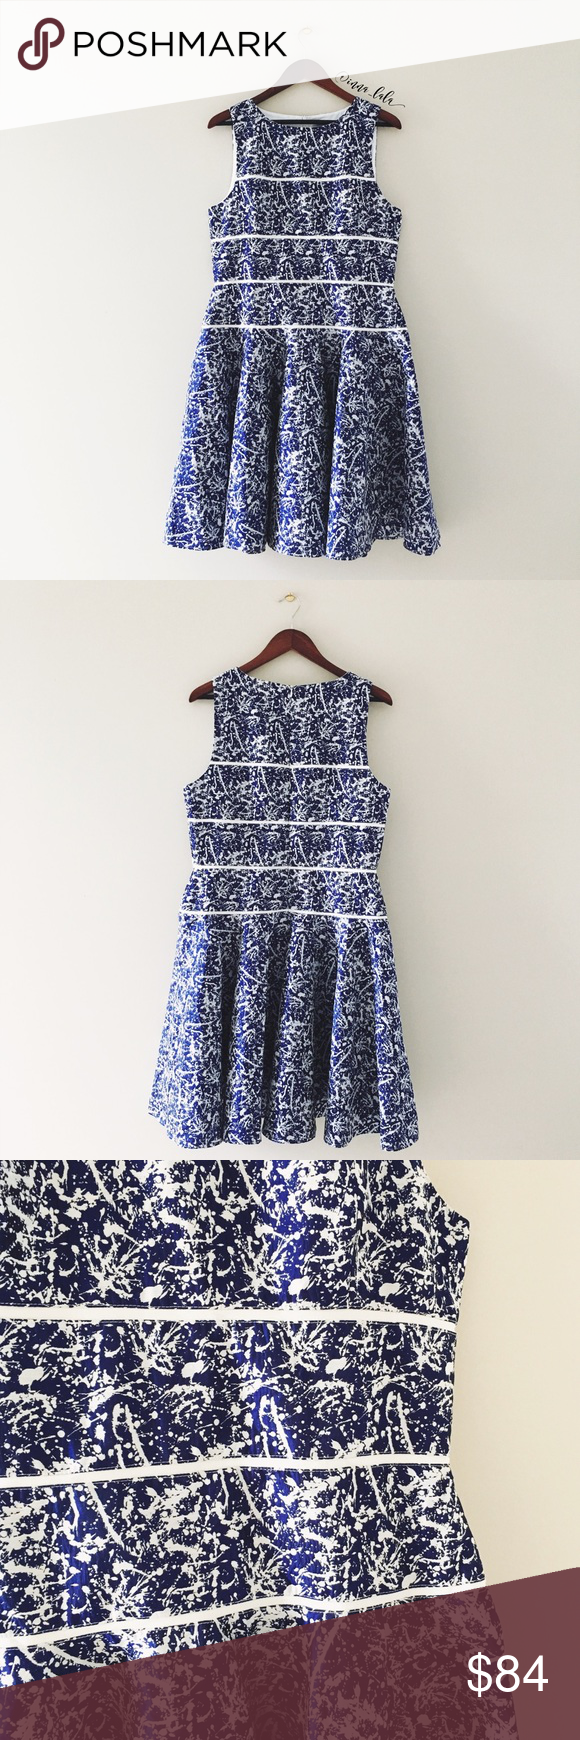 Maeve splatter print brocade sleeveless dress anthropologie and